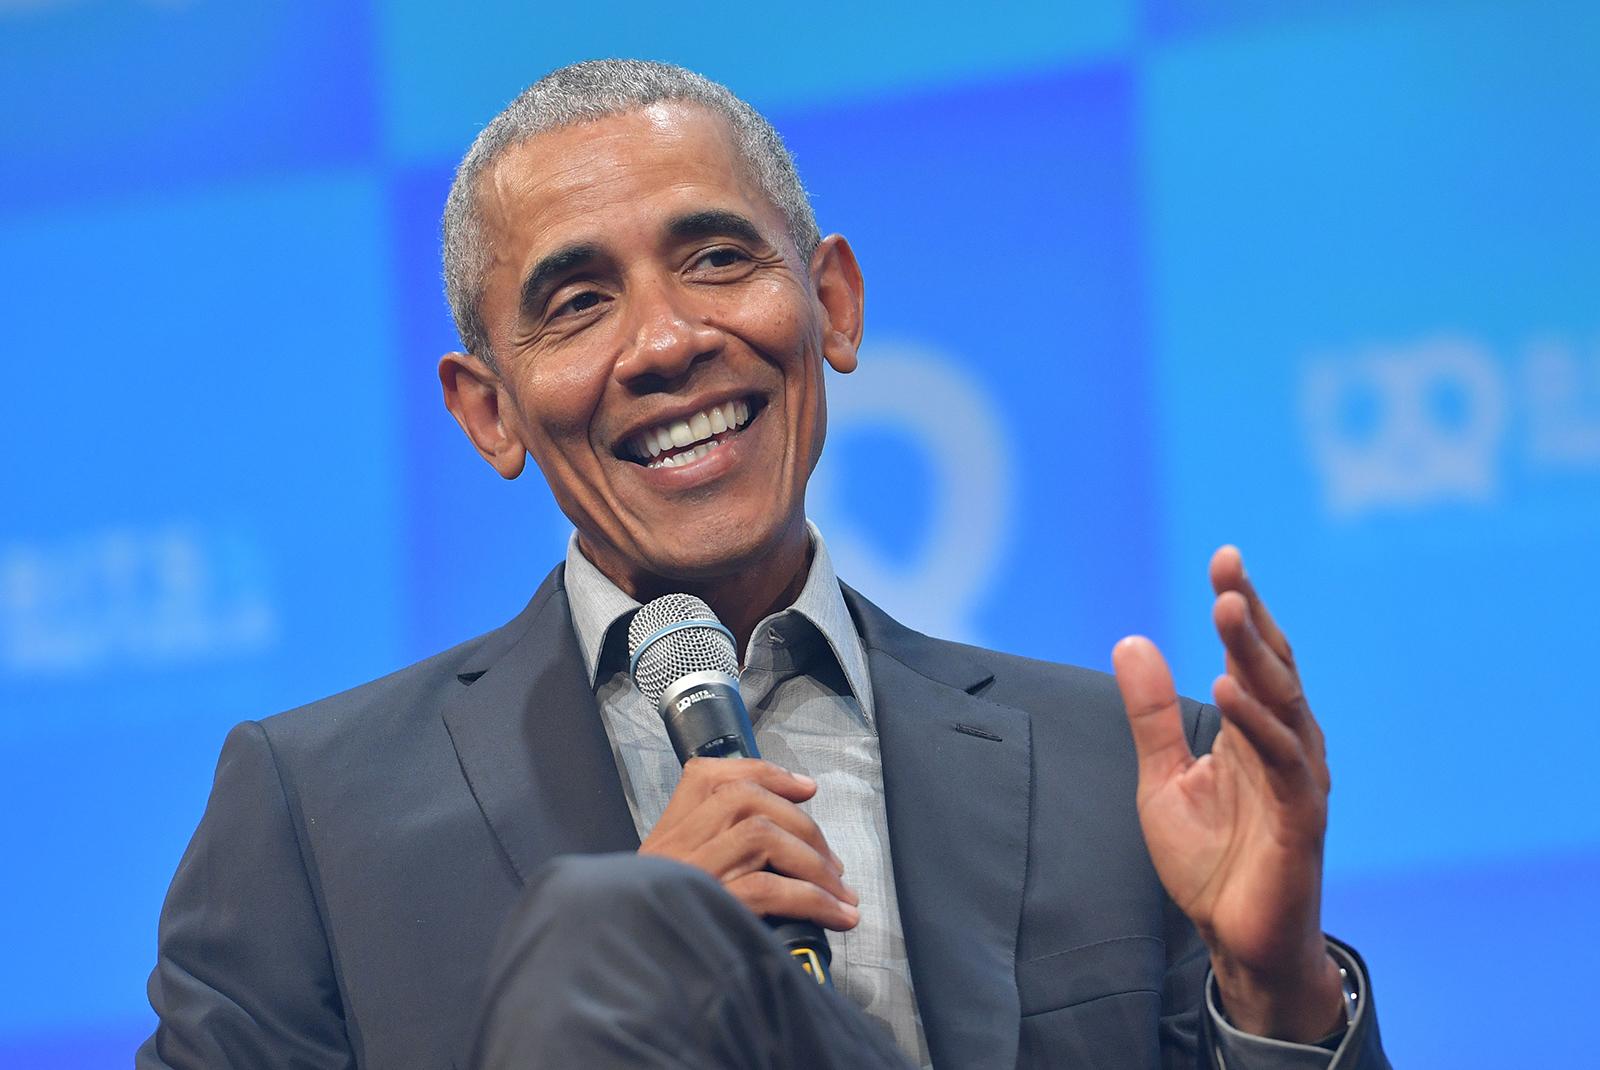 Former President Barack Obama speaks at the opening of the Bits & Pretzels meetup on September 29, 2019 in Munich, Germany.